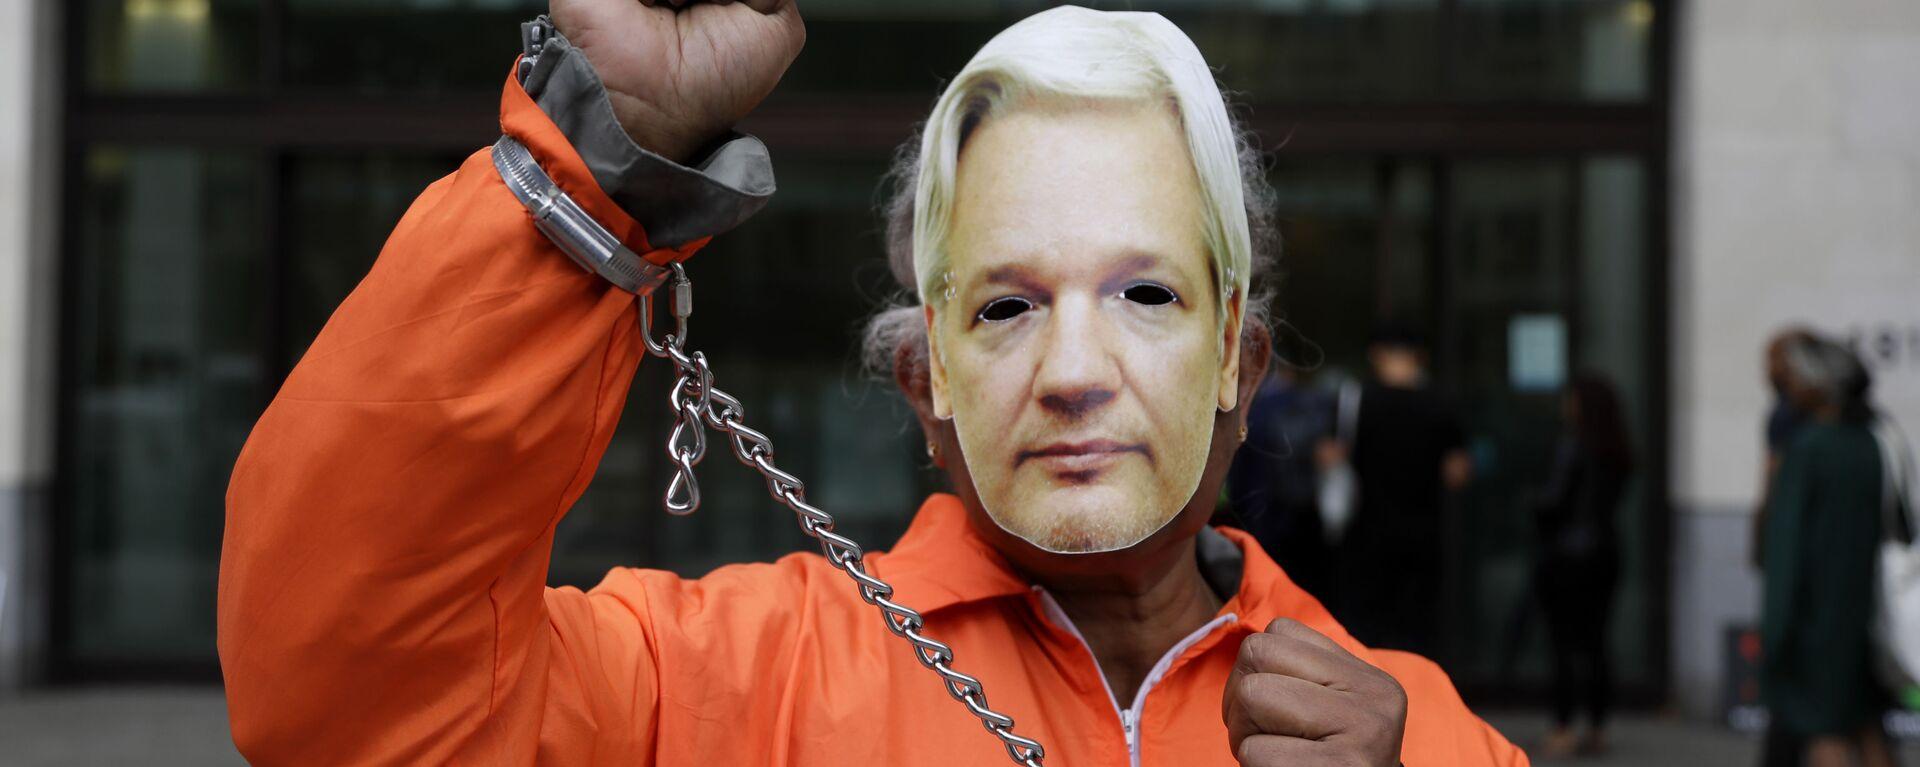 Un manifestante por la liberación del fundador de Wikileaks, Julian Assange - Sputnik Mundo, 1920, 16.09.2020